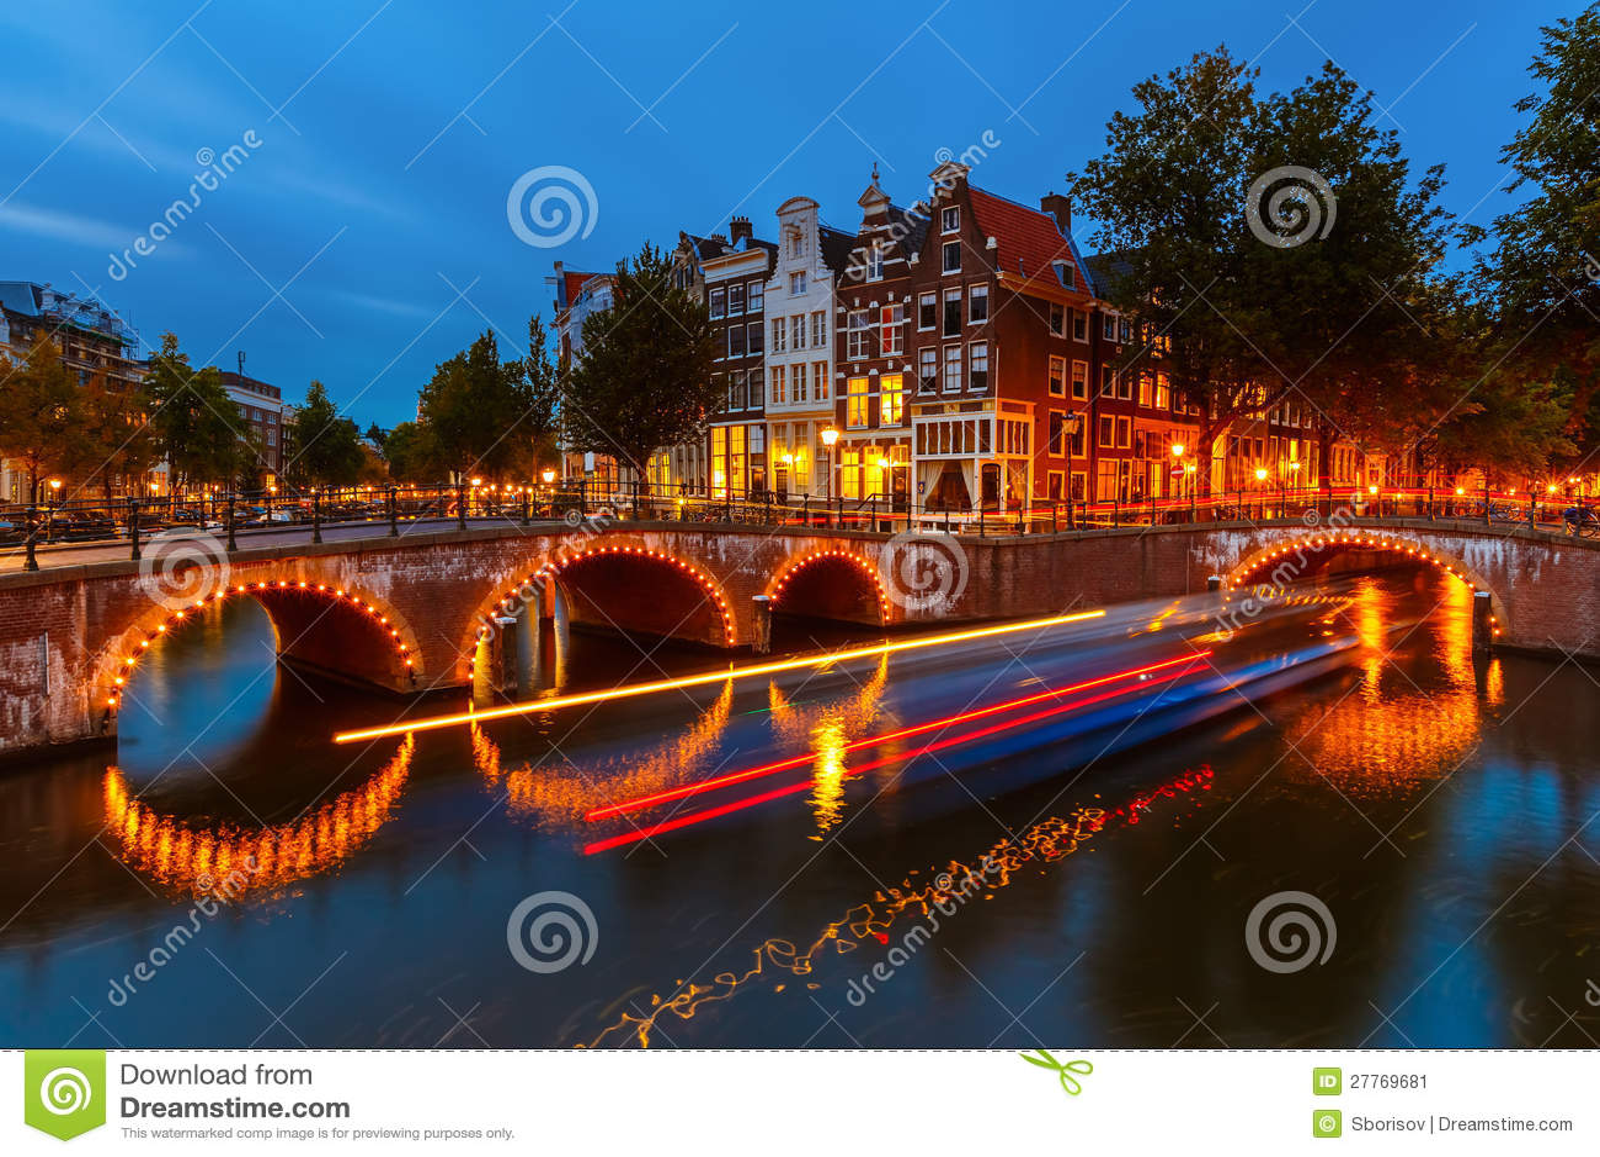 Каналы в Амстердам